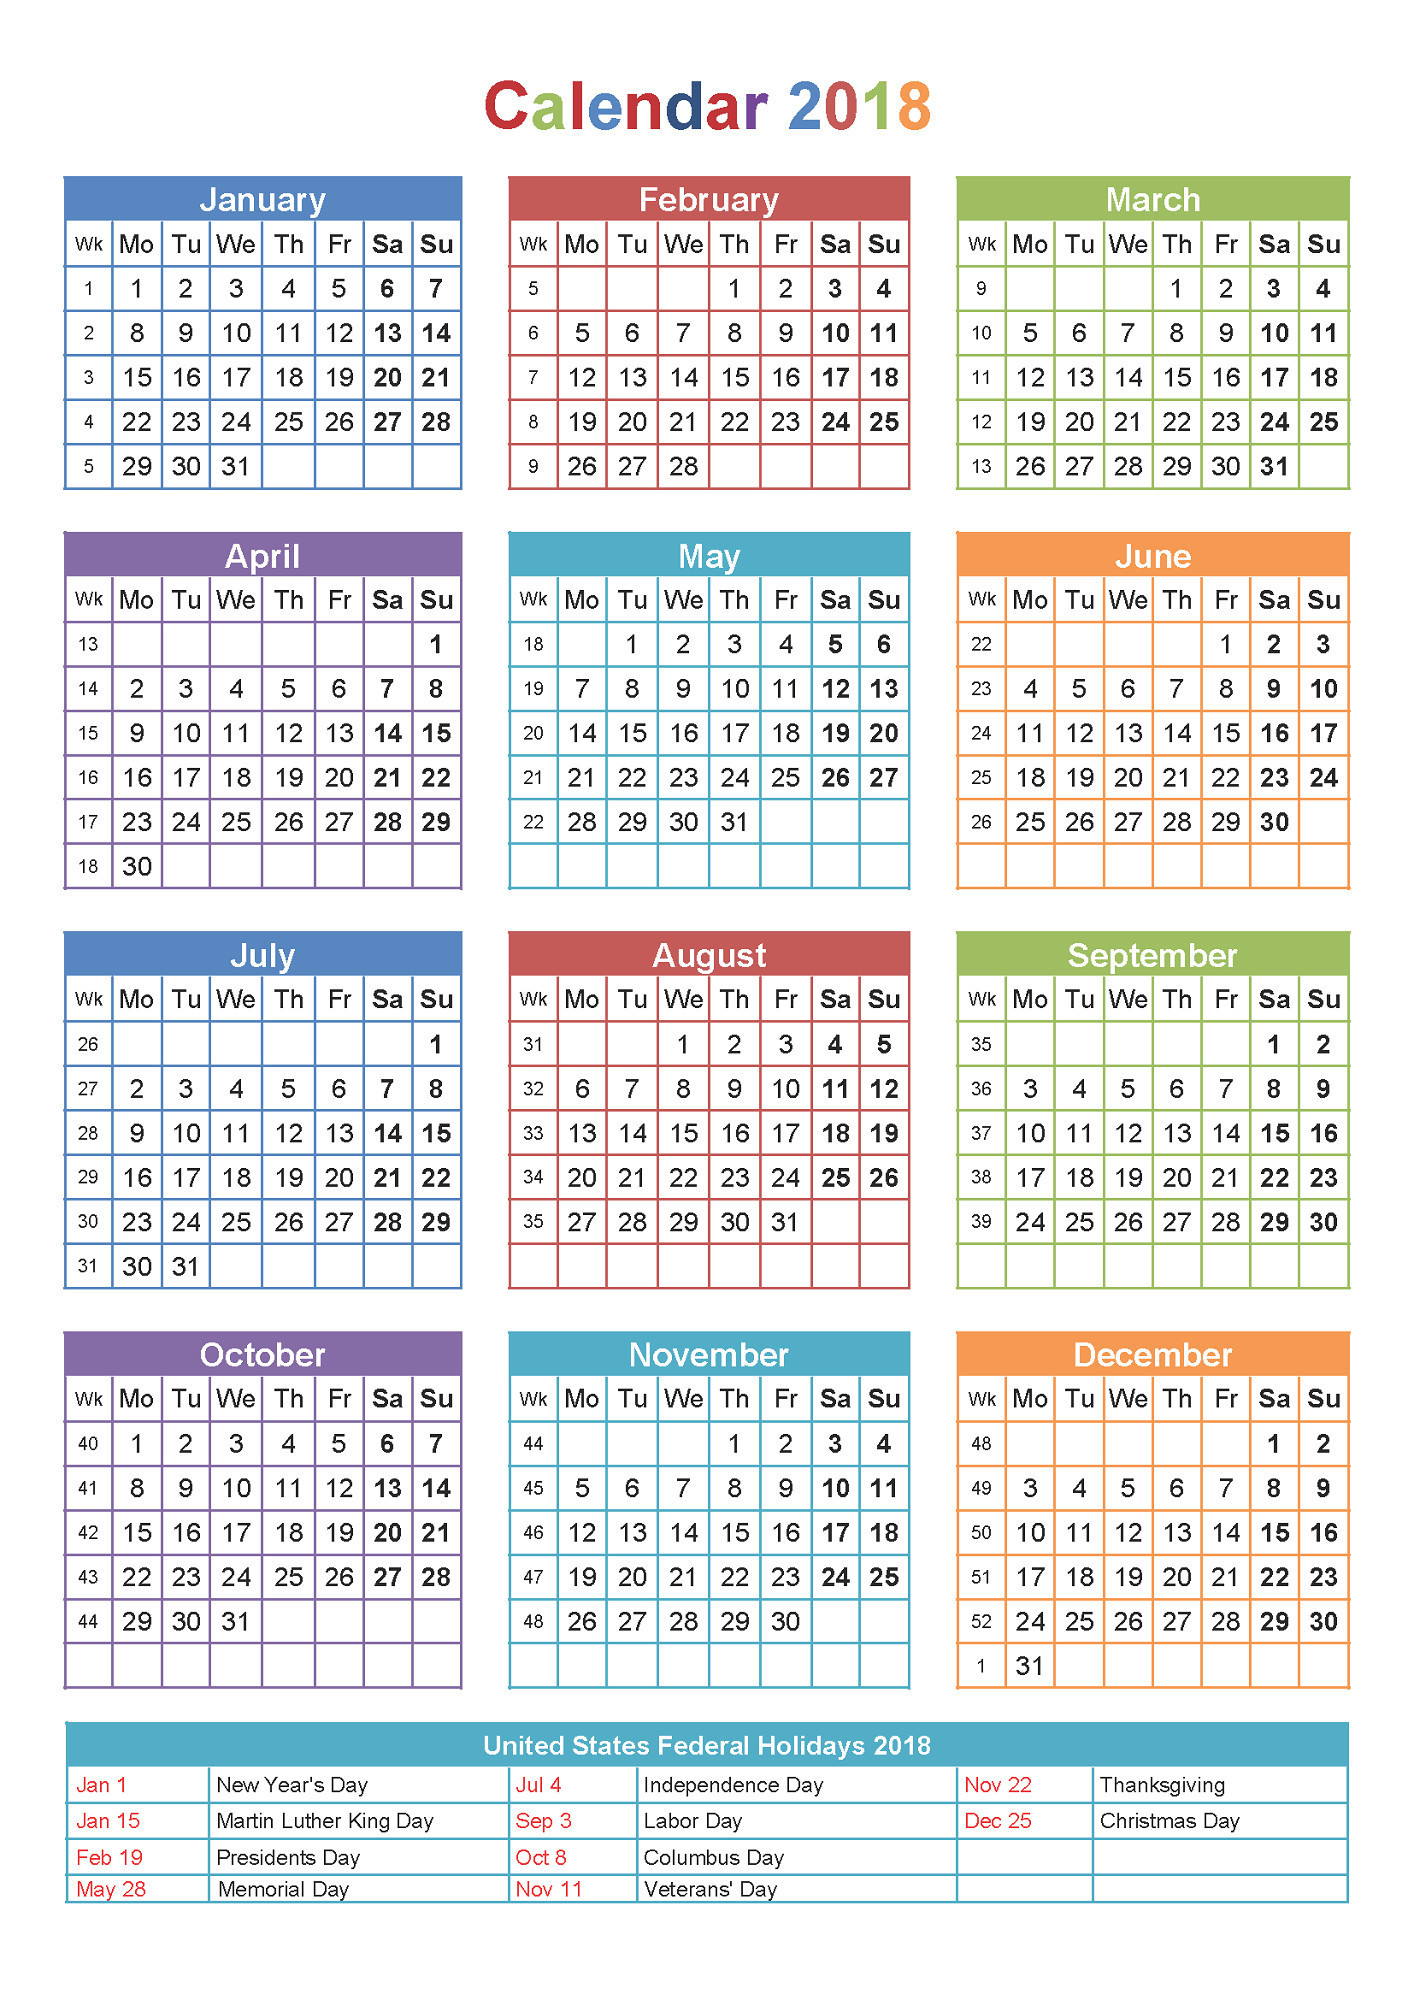 Desktop Wallpapers Calendar March 44 Images